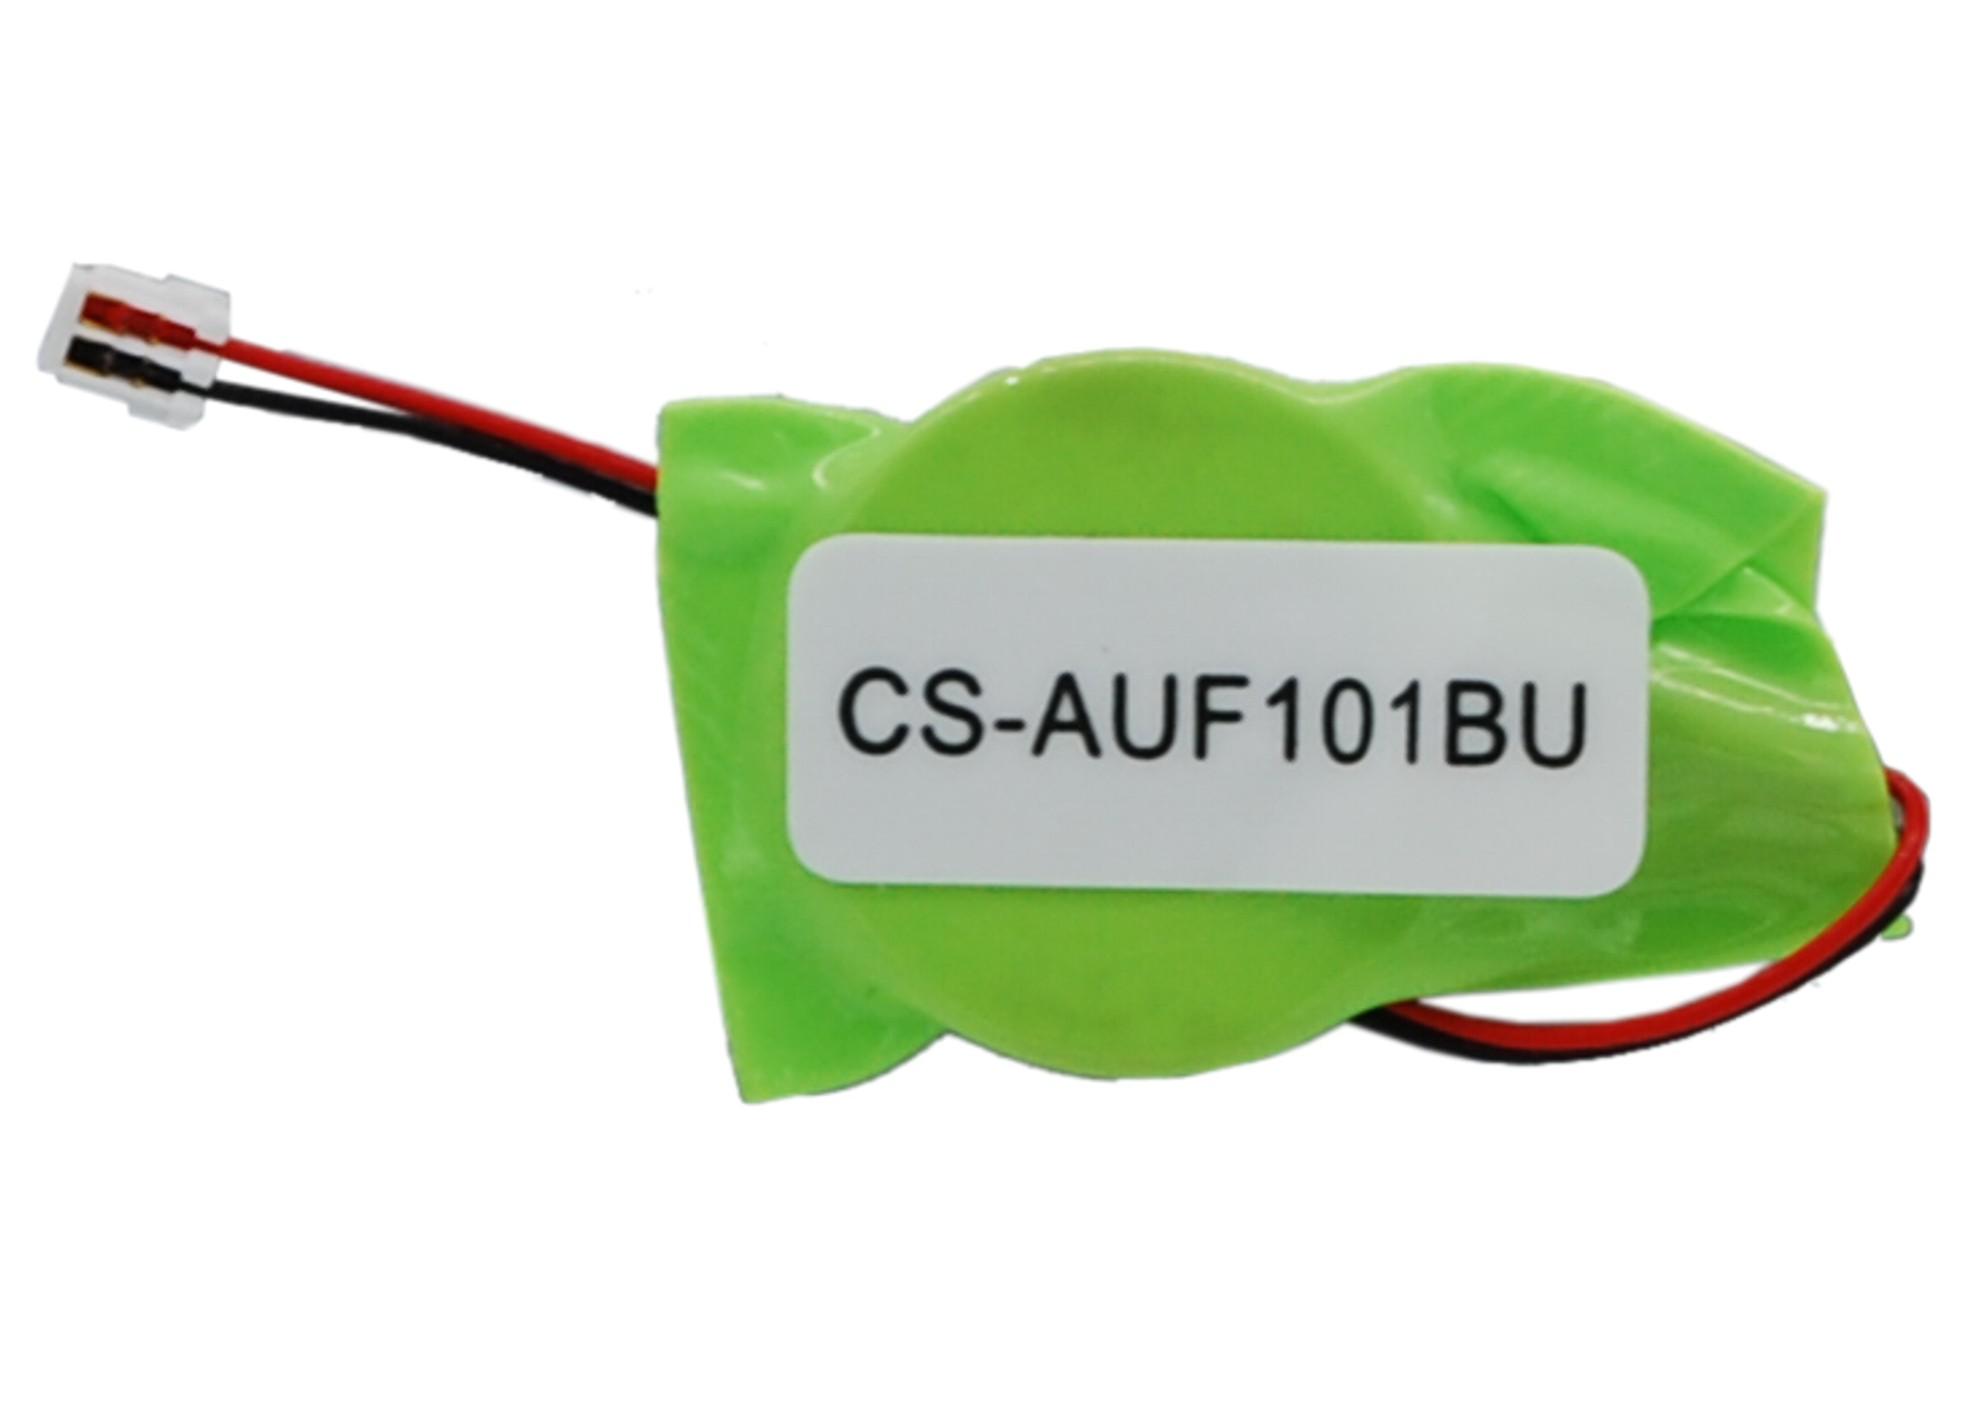 Cameron Sino baterie cmos pro ASUS Transformer Prime TF201-C1-CG 3V Li-ion 40mAh zelená - neoriginální